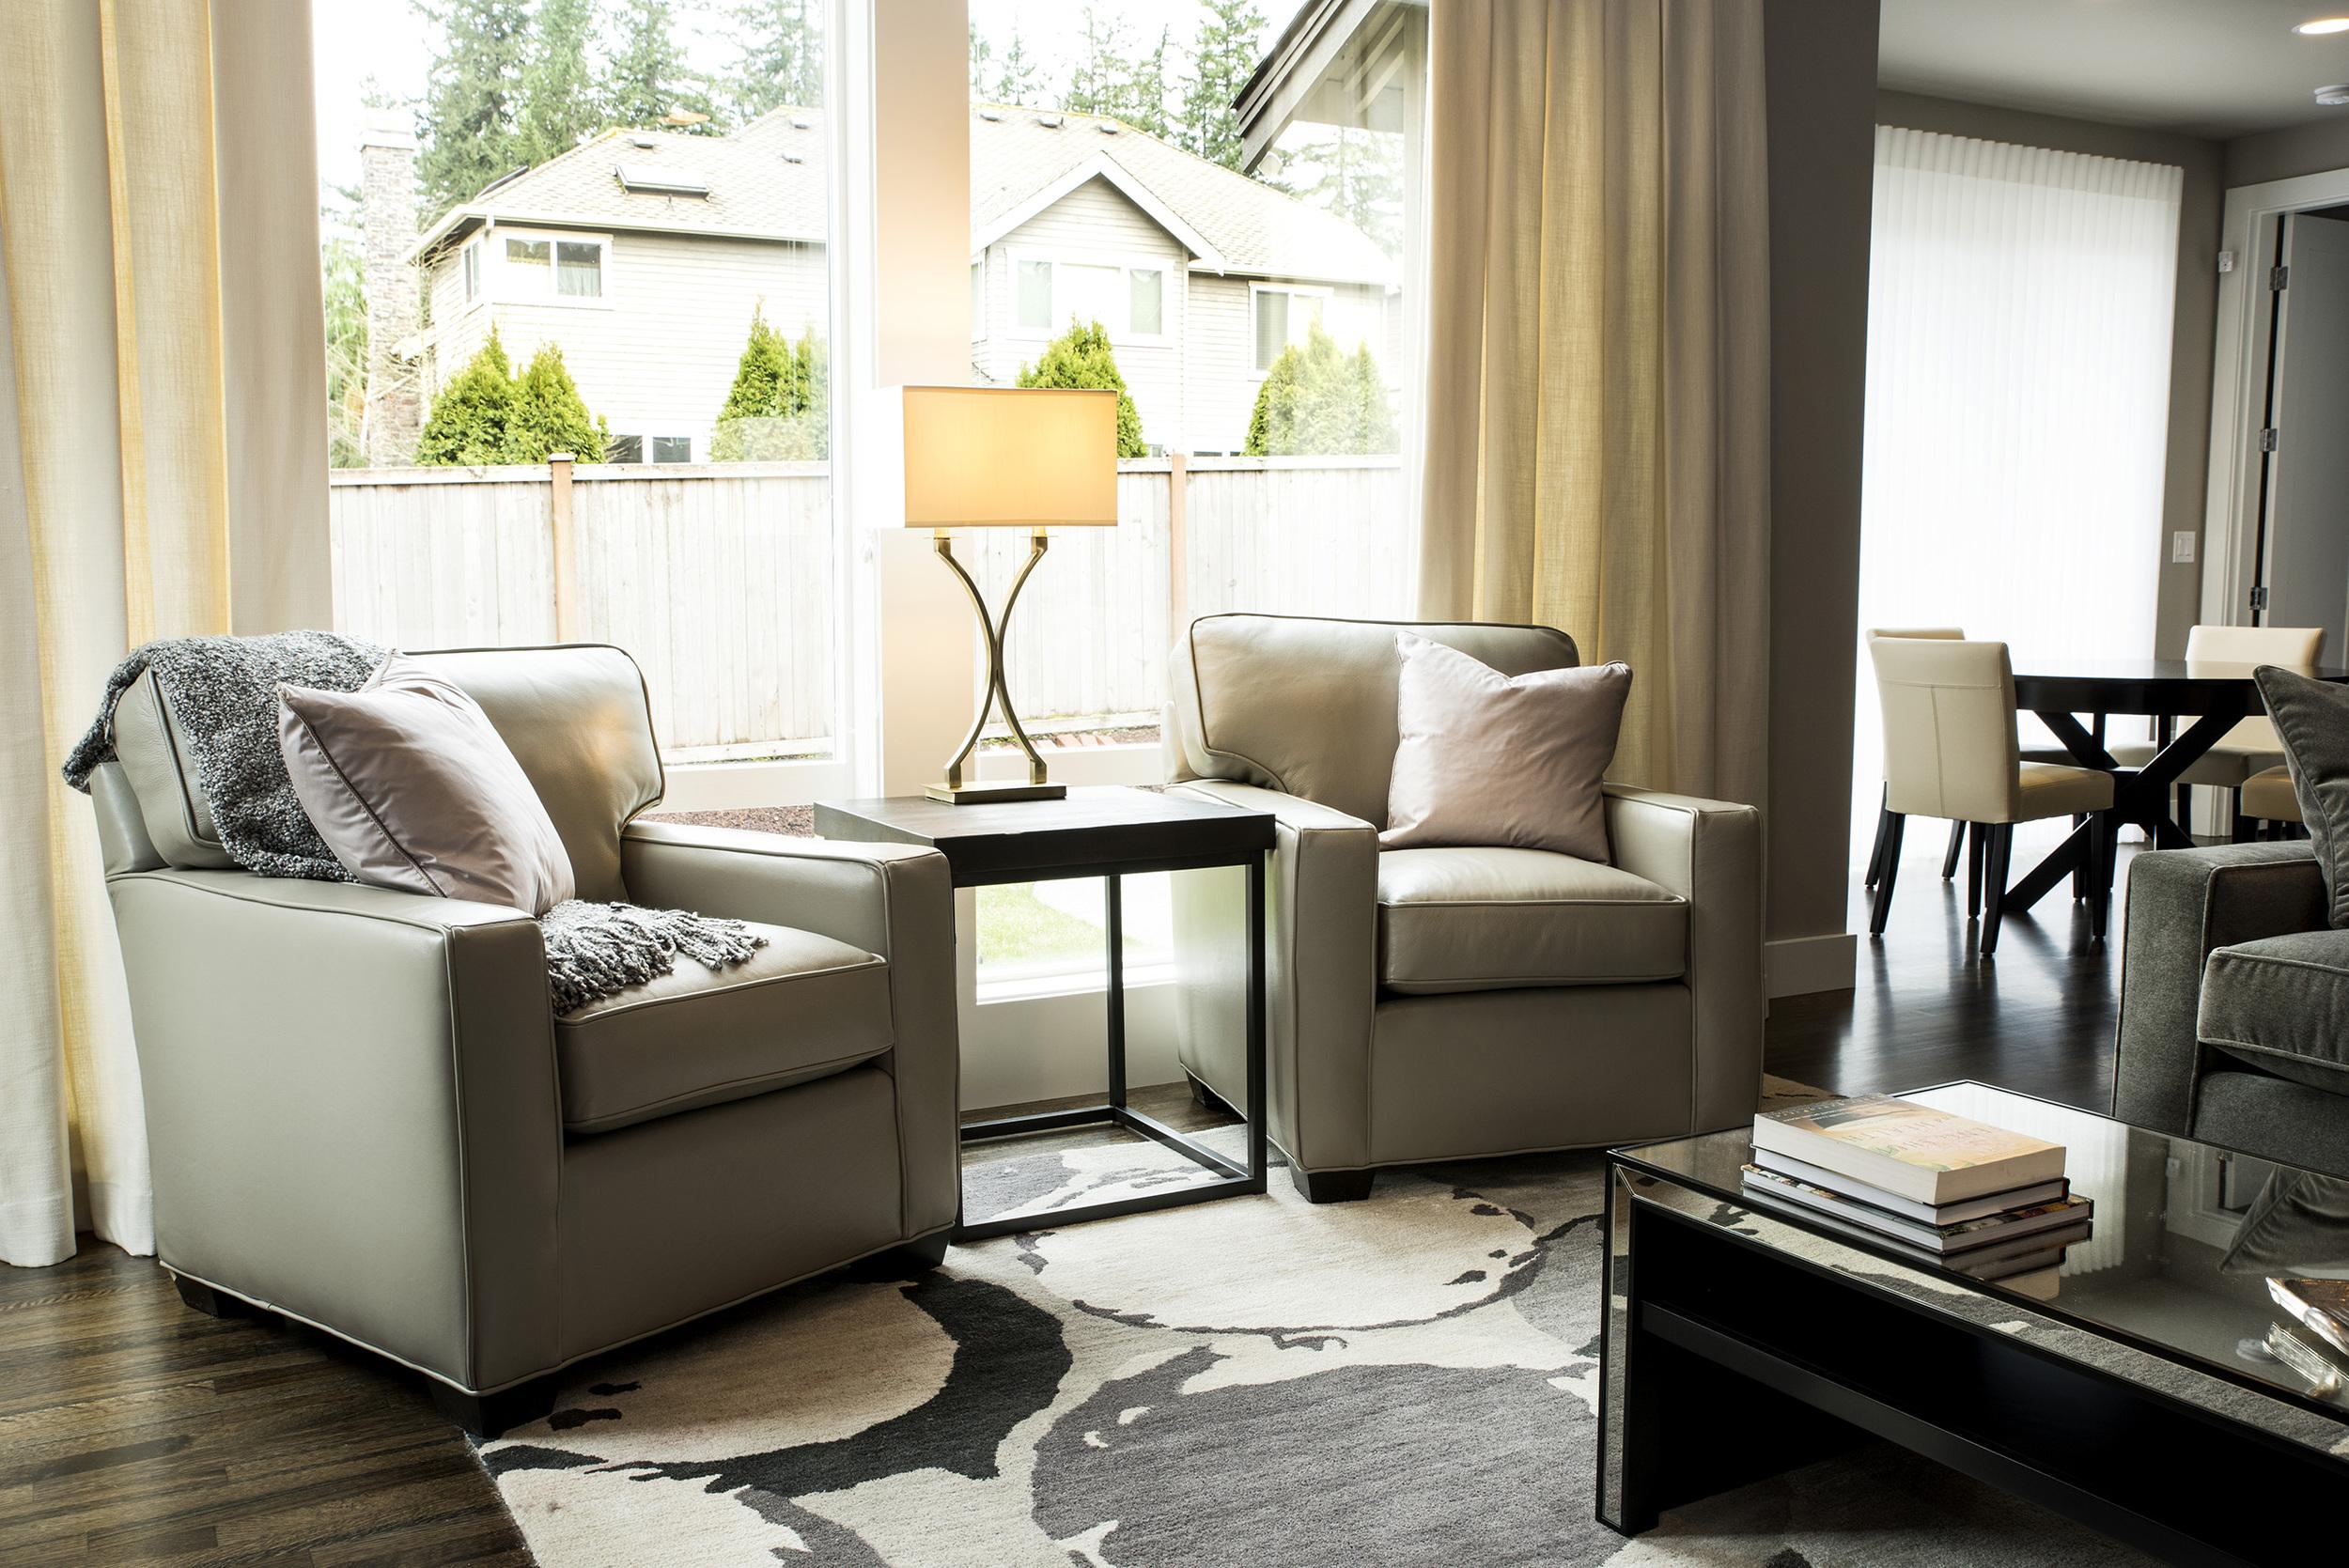 Living space designed by Tatiana Hisel Interior Design